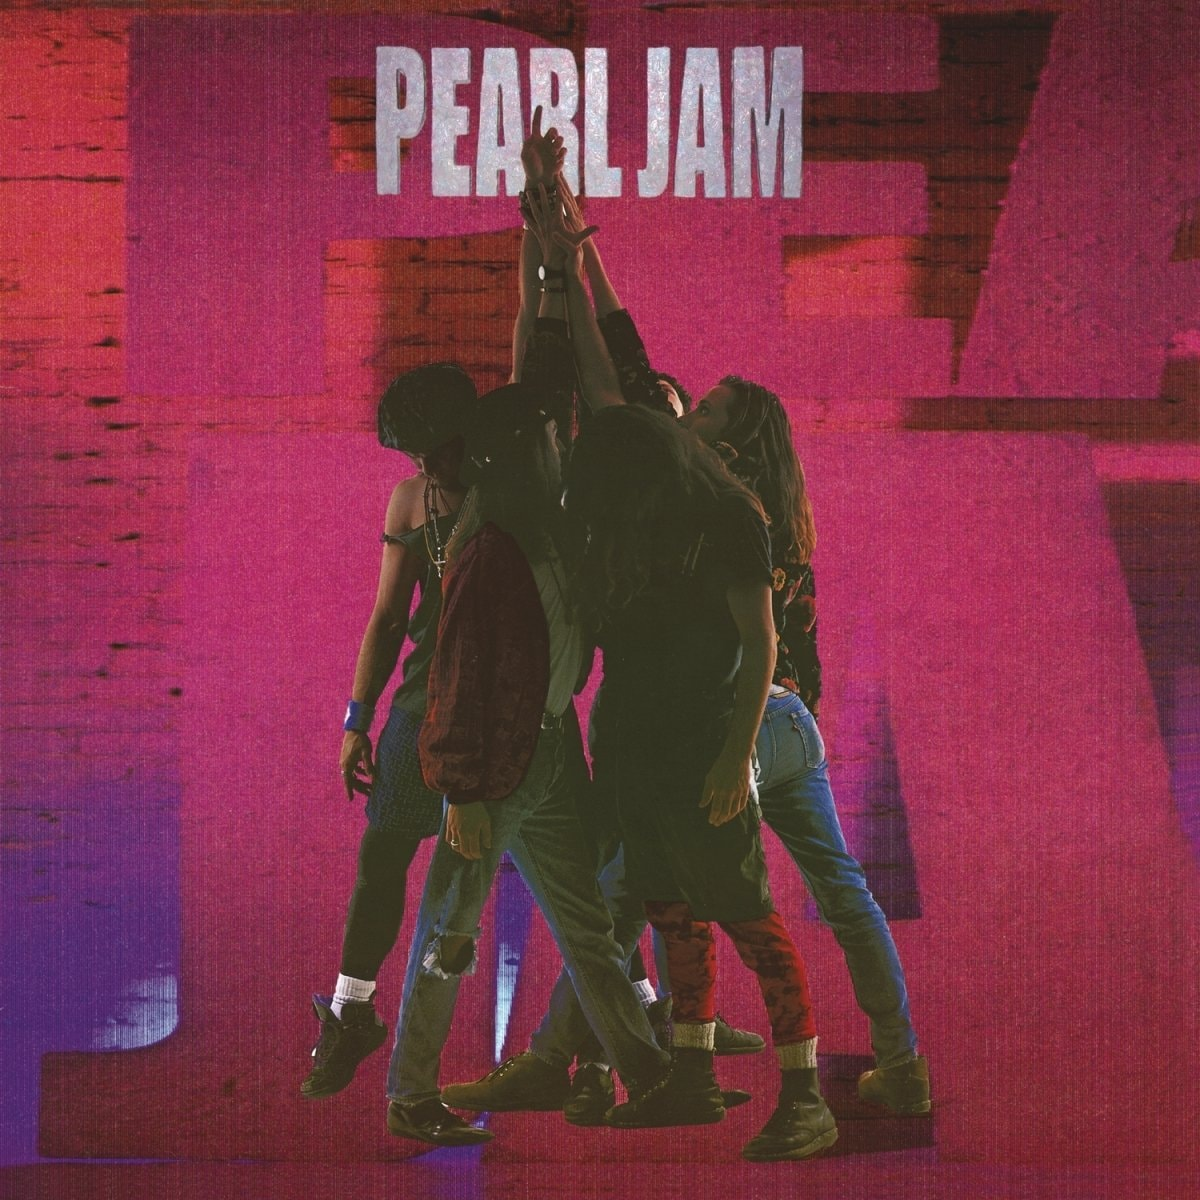 Pearl Jam - 'Ten' - Released August 27, 1991.